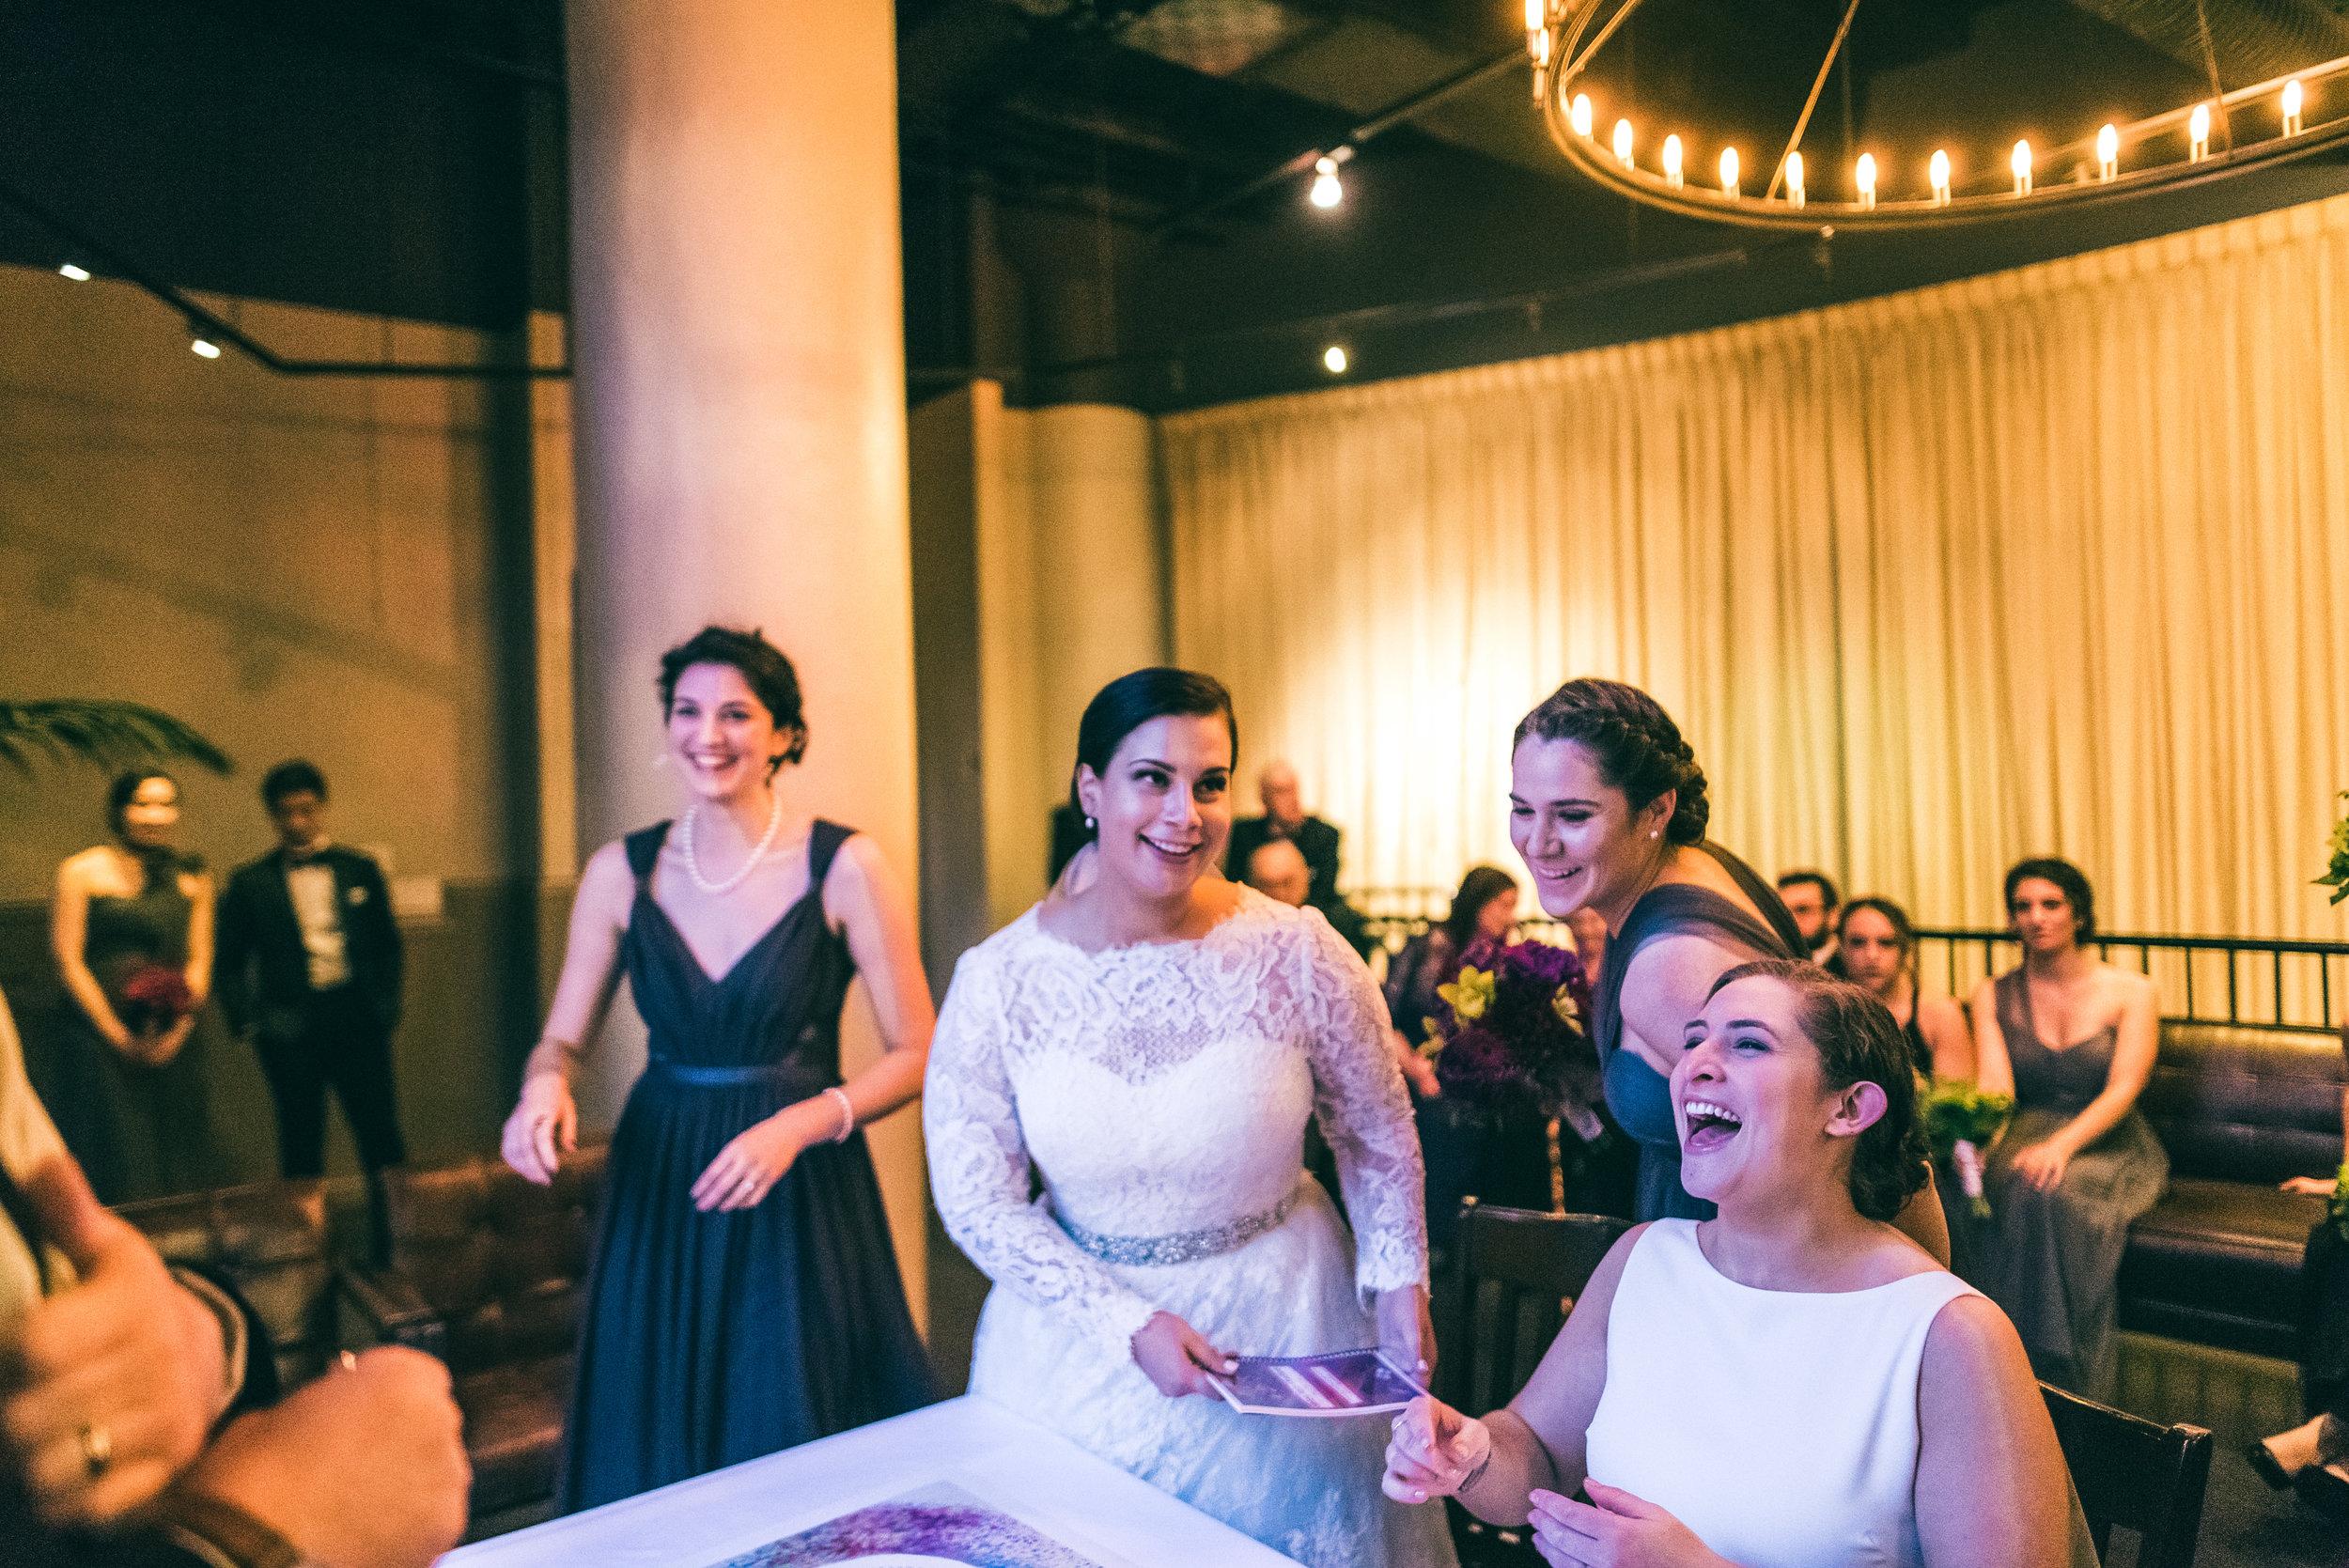 Jewish wedding ceremony for two brides